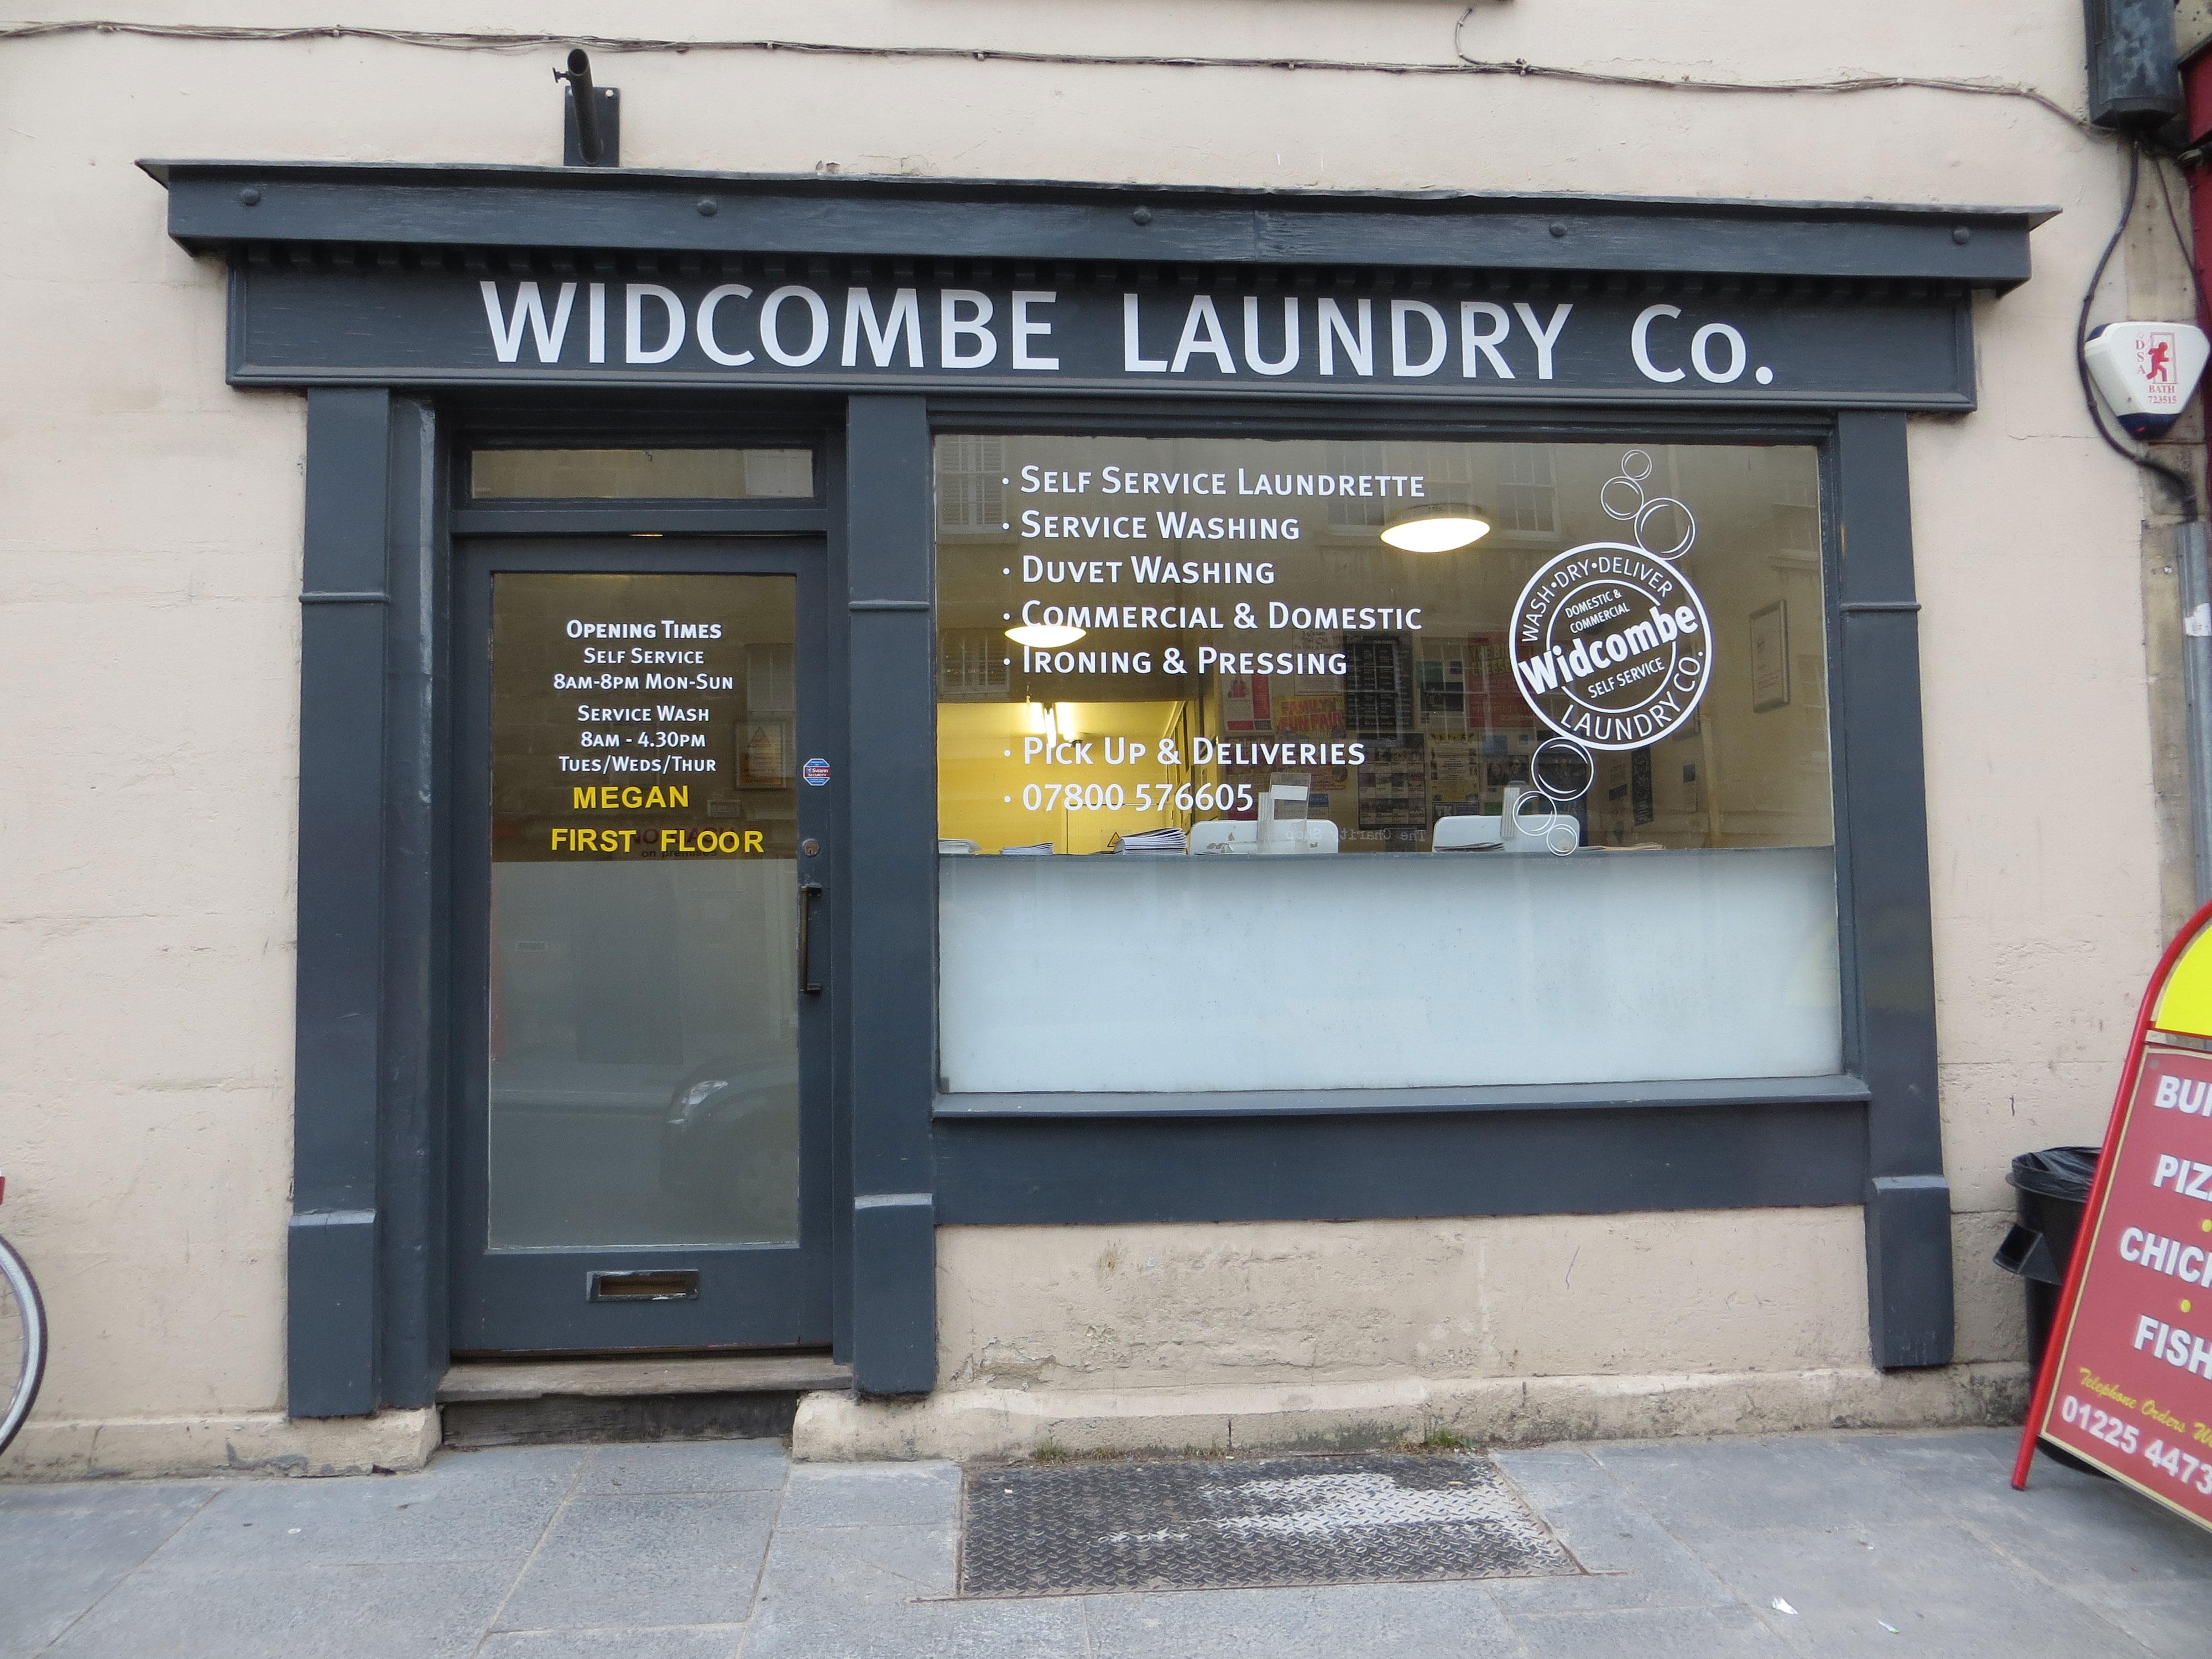 The dress agency widcombe bath - Widcombe Laundry Company